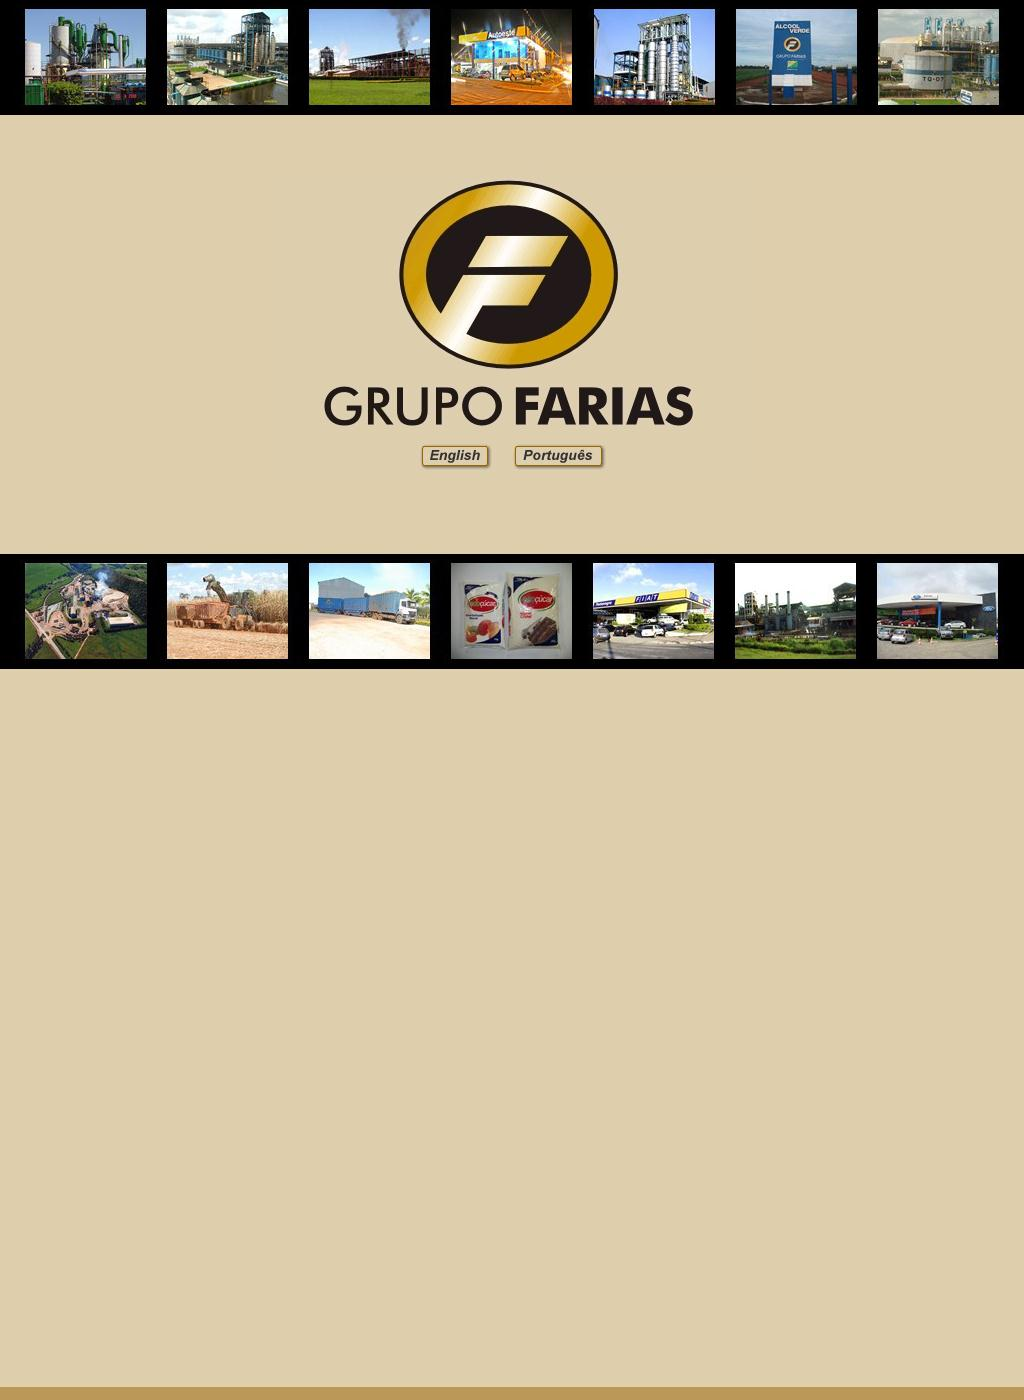 Grupo Farias